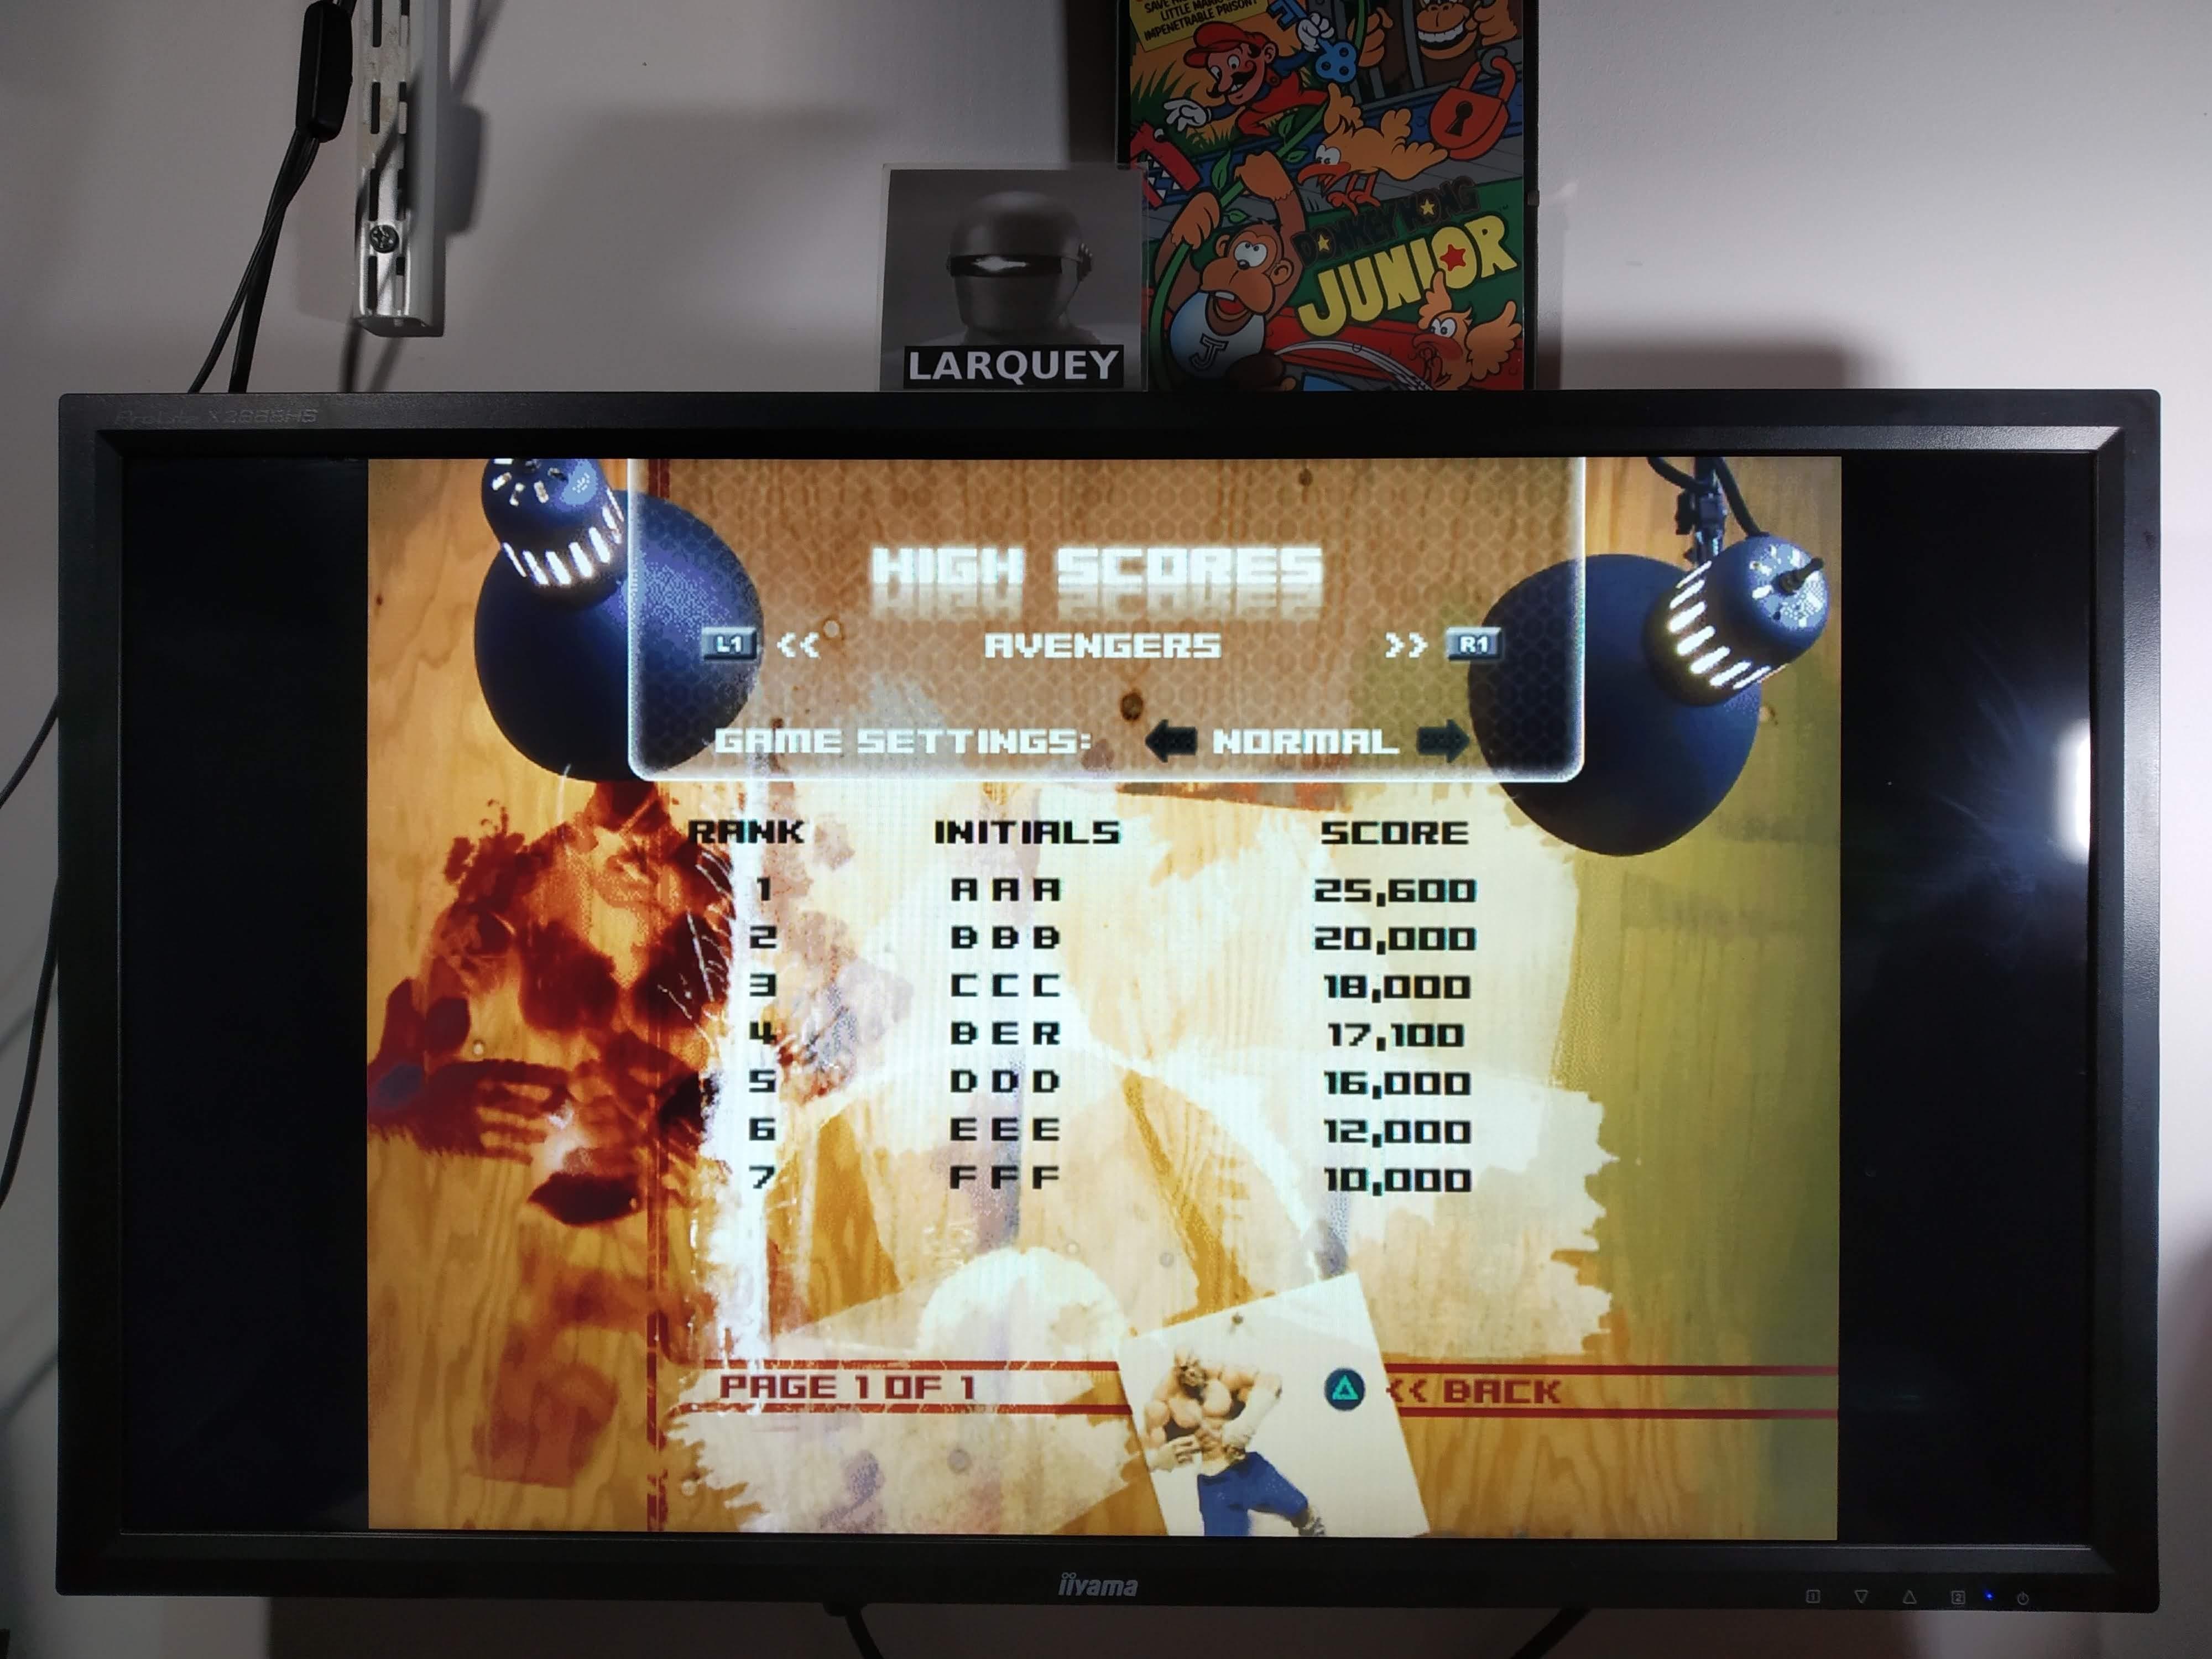 Larquey: Capcom Classics Vol 2: Avengers [Normal] (Playstation 2 Emulated) 17,100 points on 2020-08-01 11:33:57